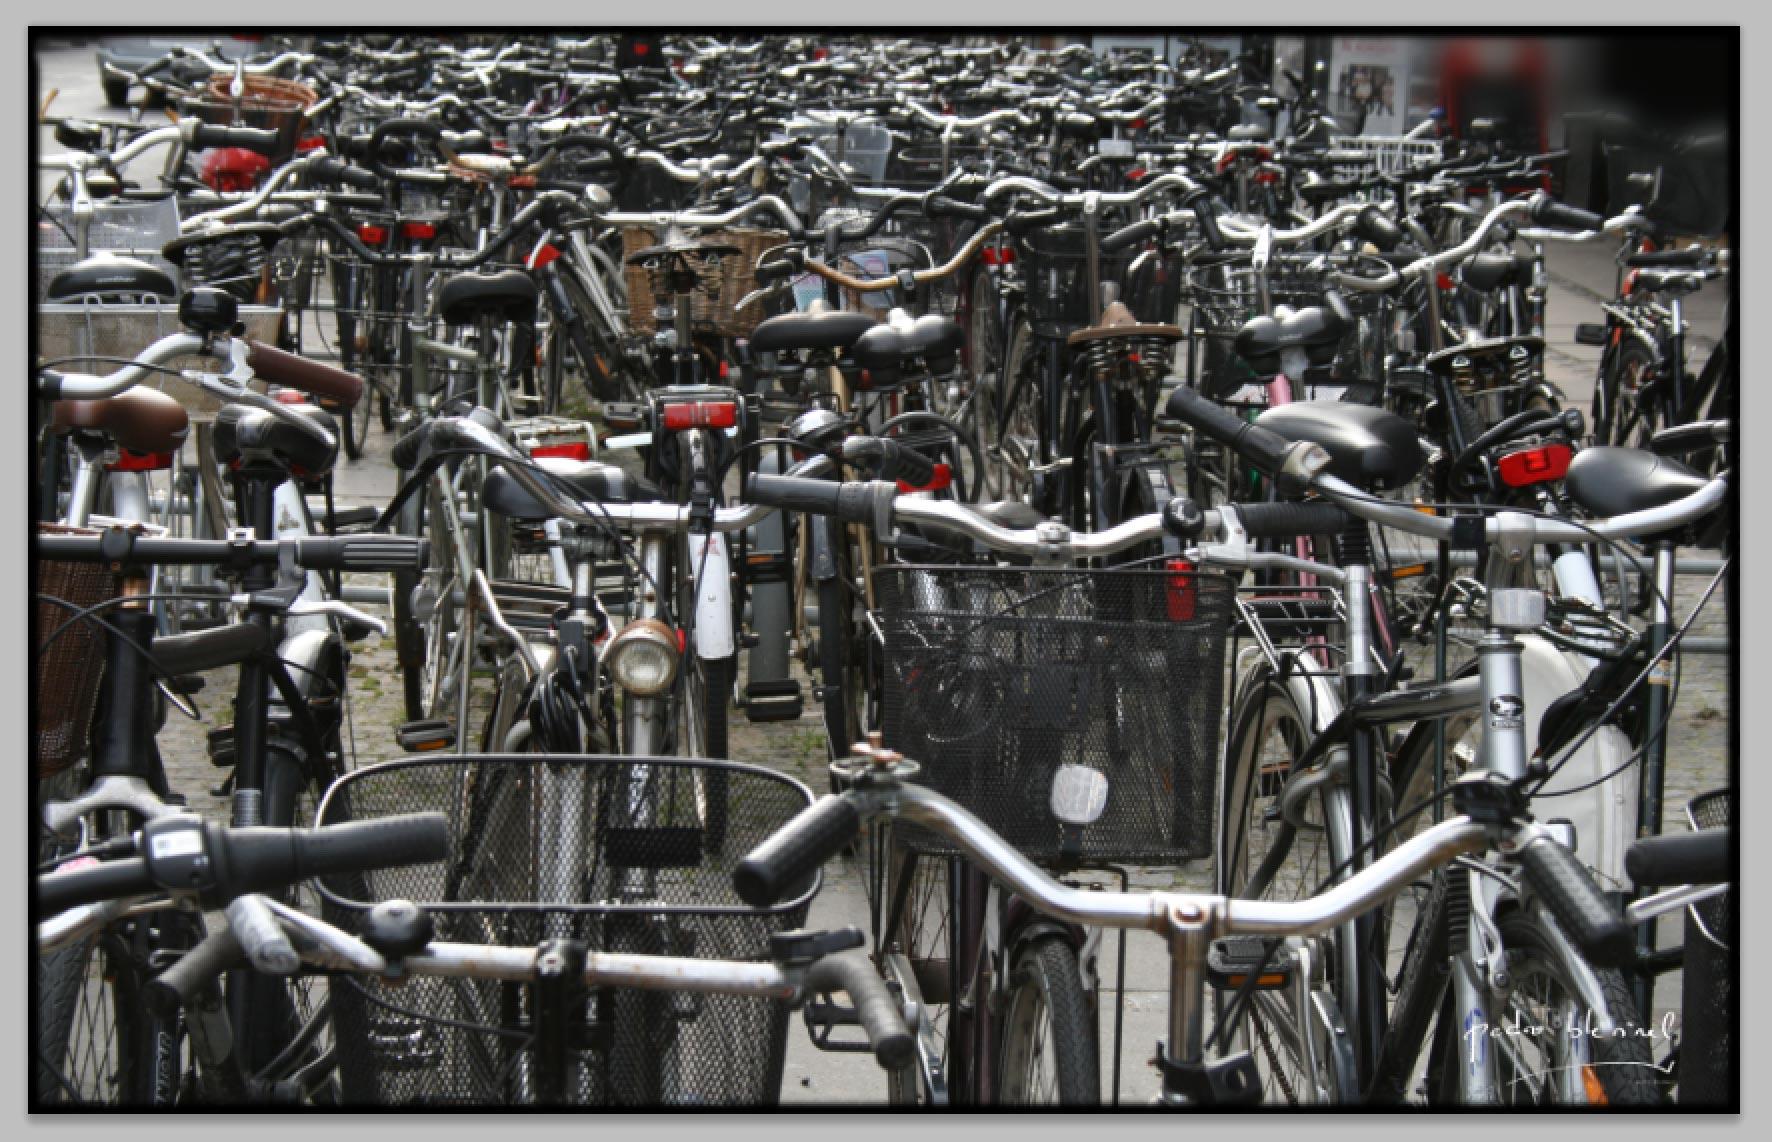 oùest mon vélo ?